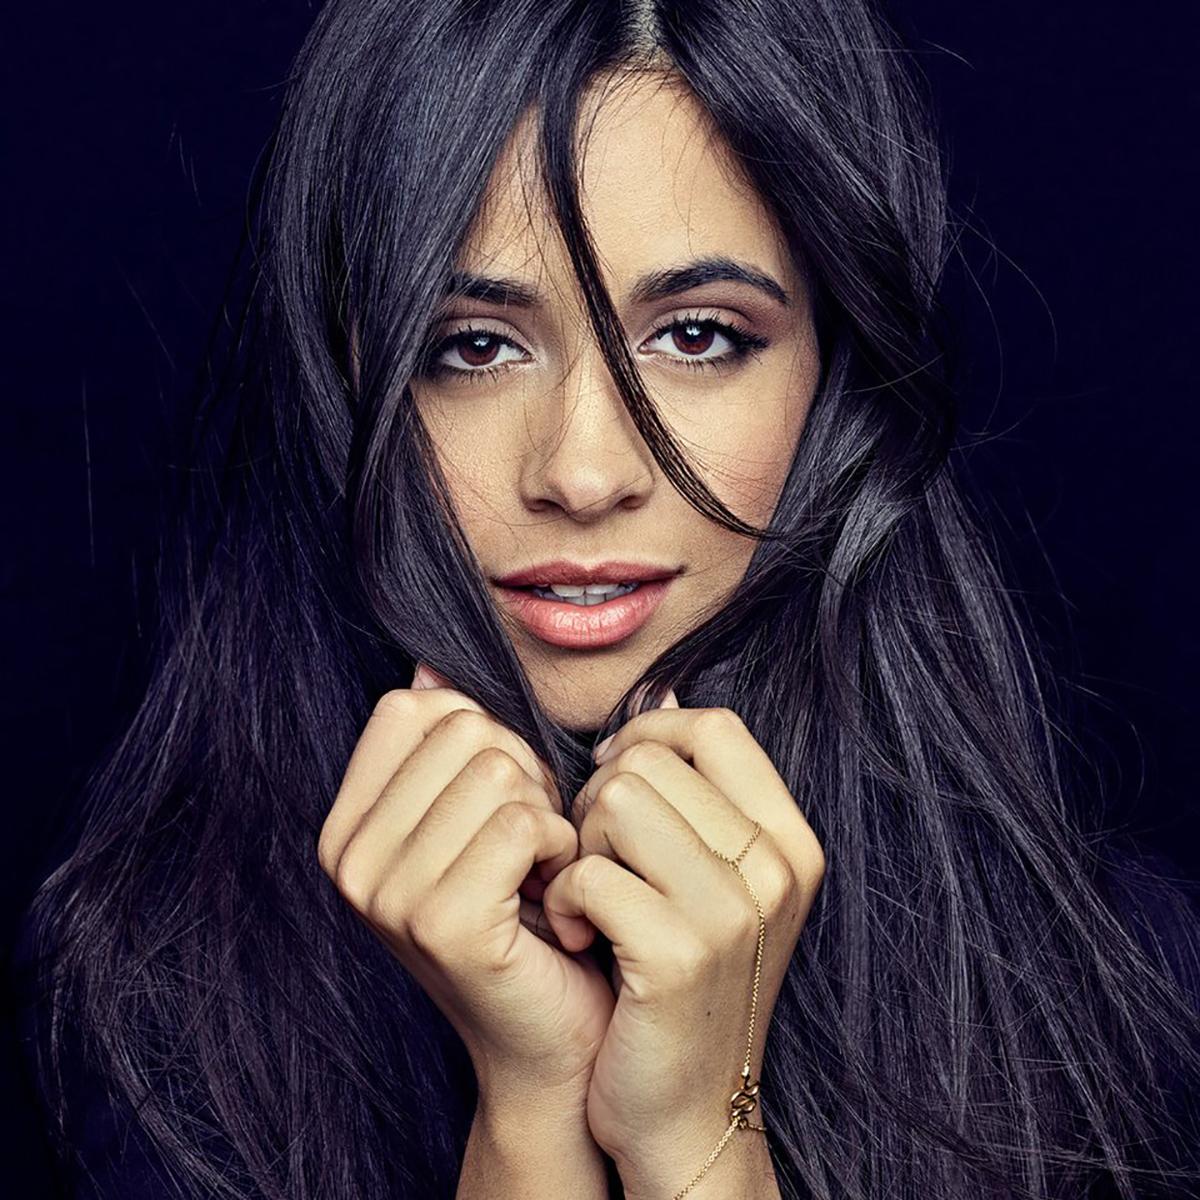 Camila cabello fifth harmony sexy dance Part 8 3